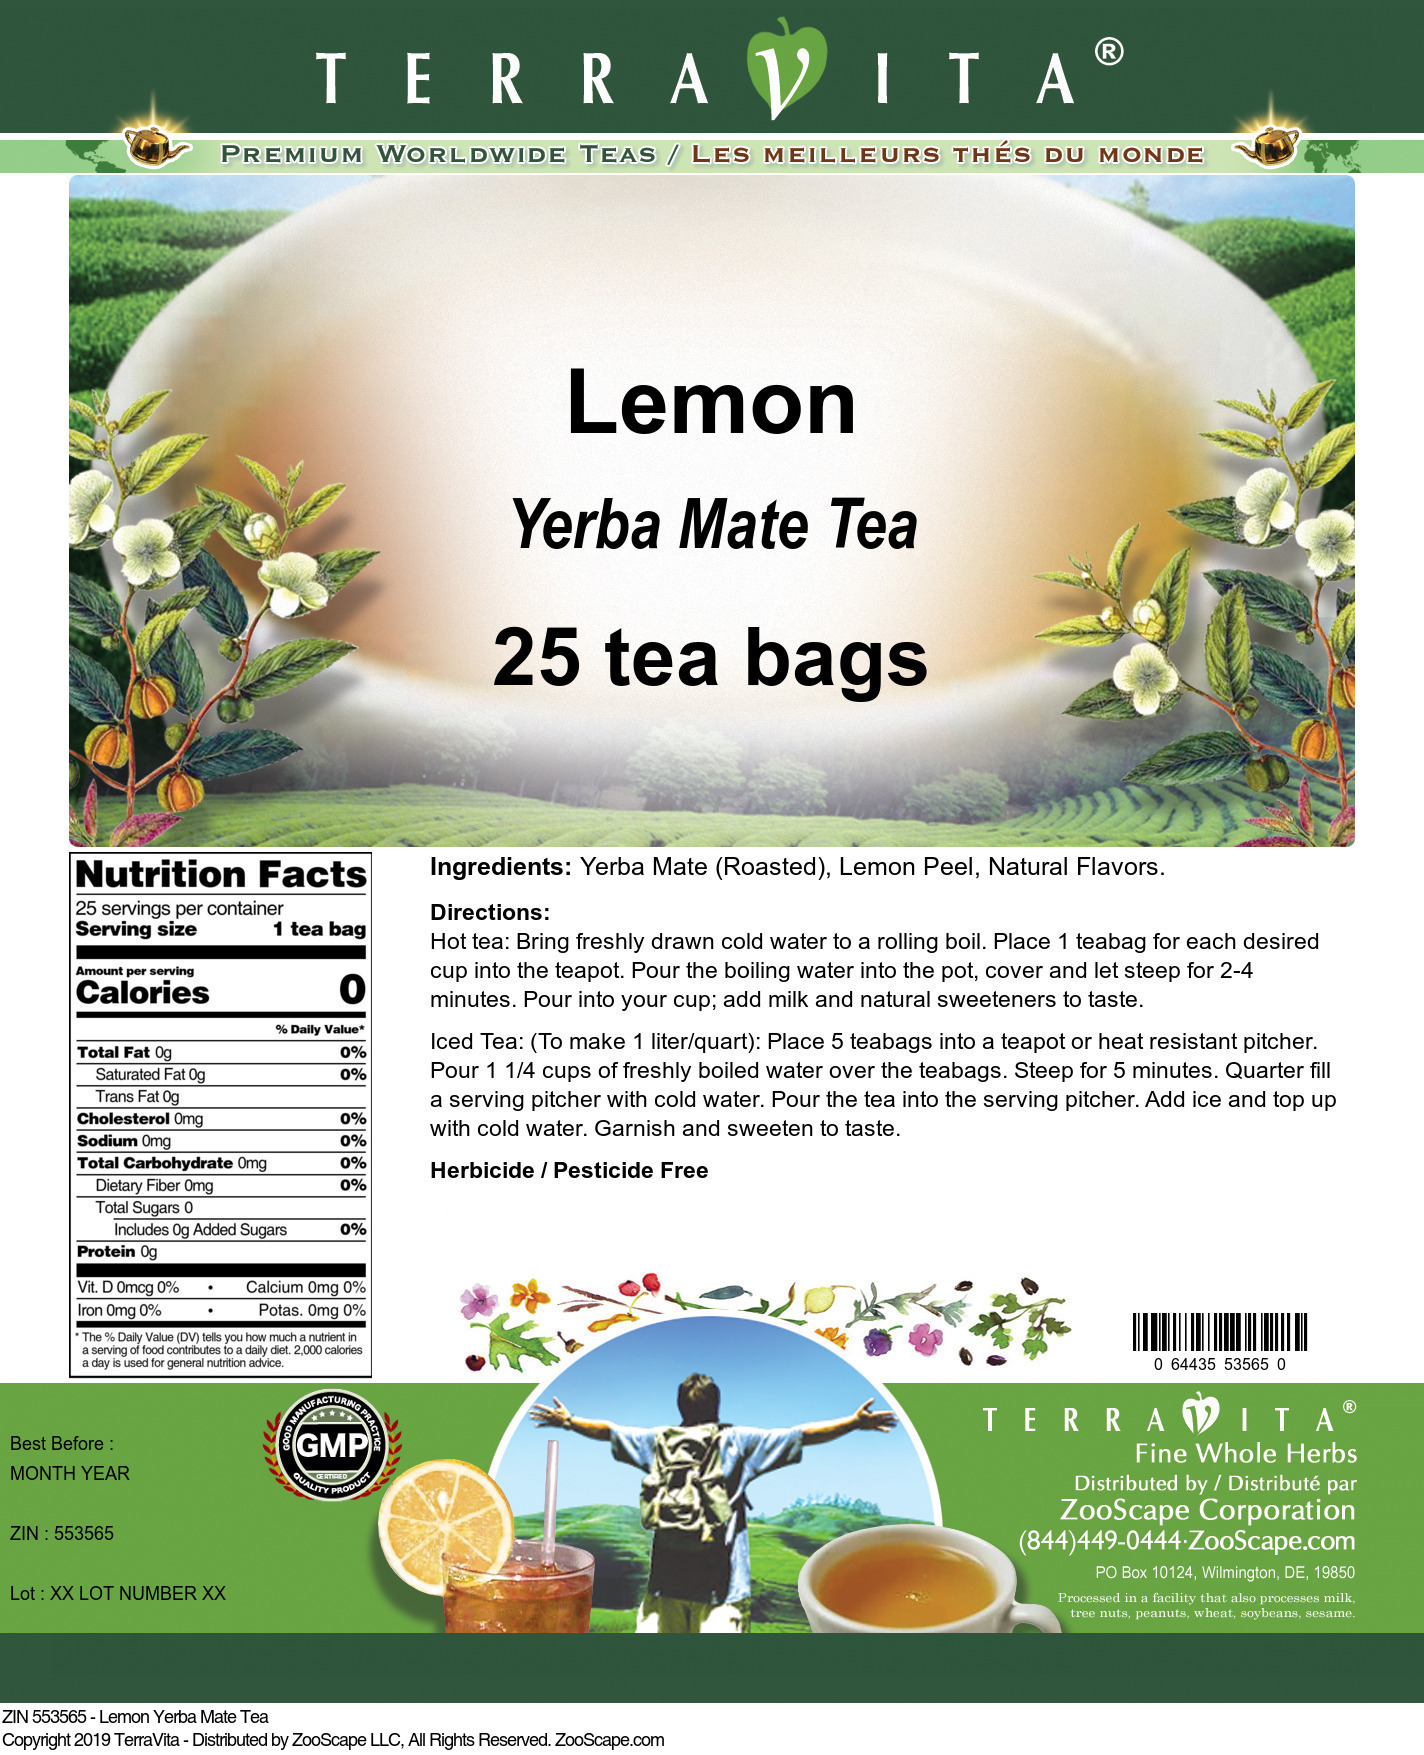 Lemon Yerba Mate Tea